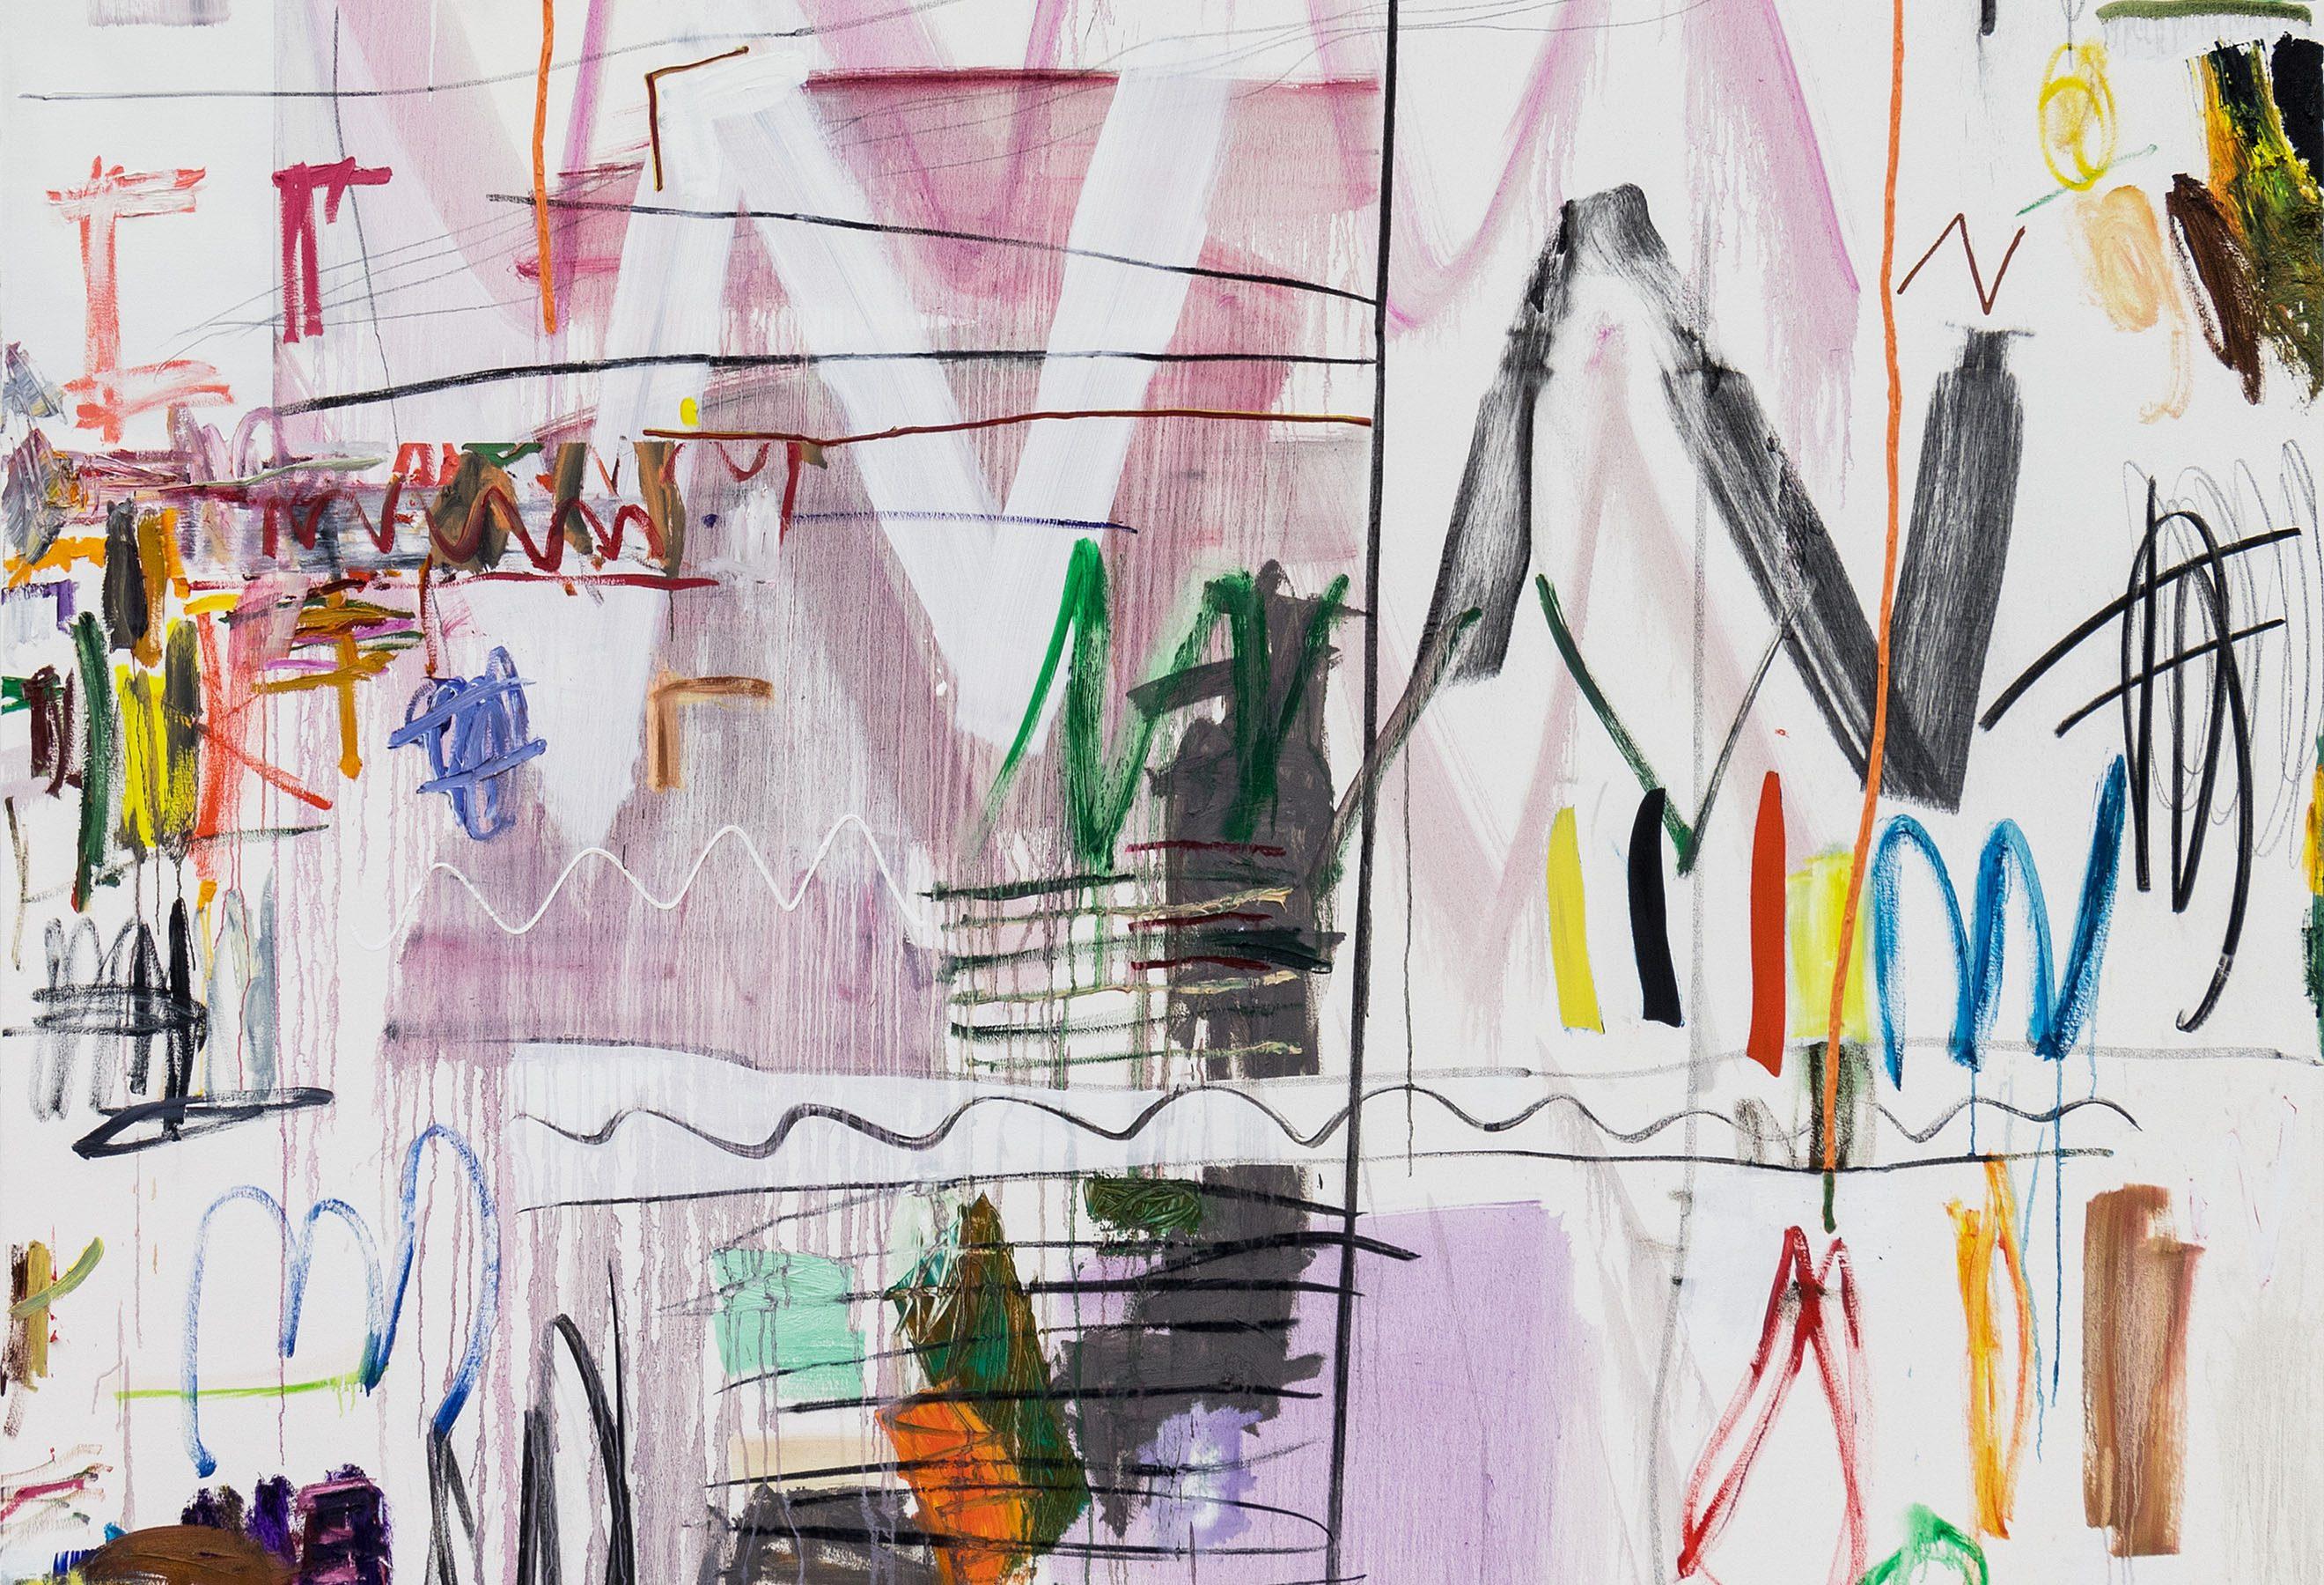 Andreas Breunig (*1983 in Eberbach/Odenwald) ´Hi-Tech Minimal No. 3` 2019 oil, charcoal, graphite on canvas 240 x 210 cm © Photo Johannes Bendzulla Courtesy Art Advisory Alexander Warhus, Cologne & Nino Mier Gallery, Los Angeles, 2019